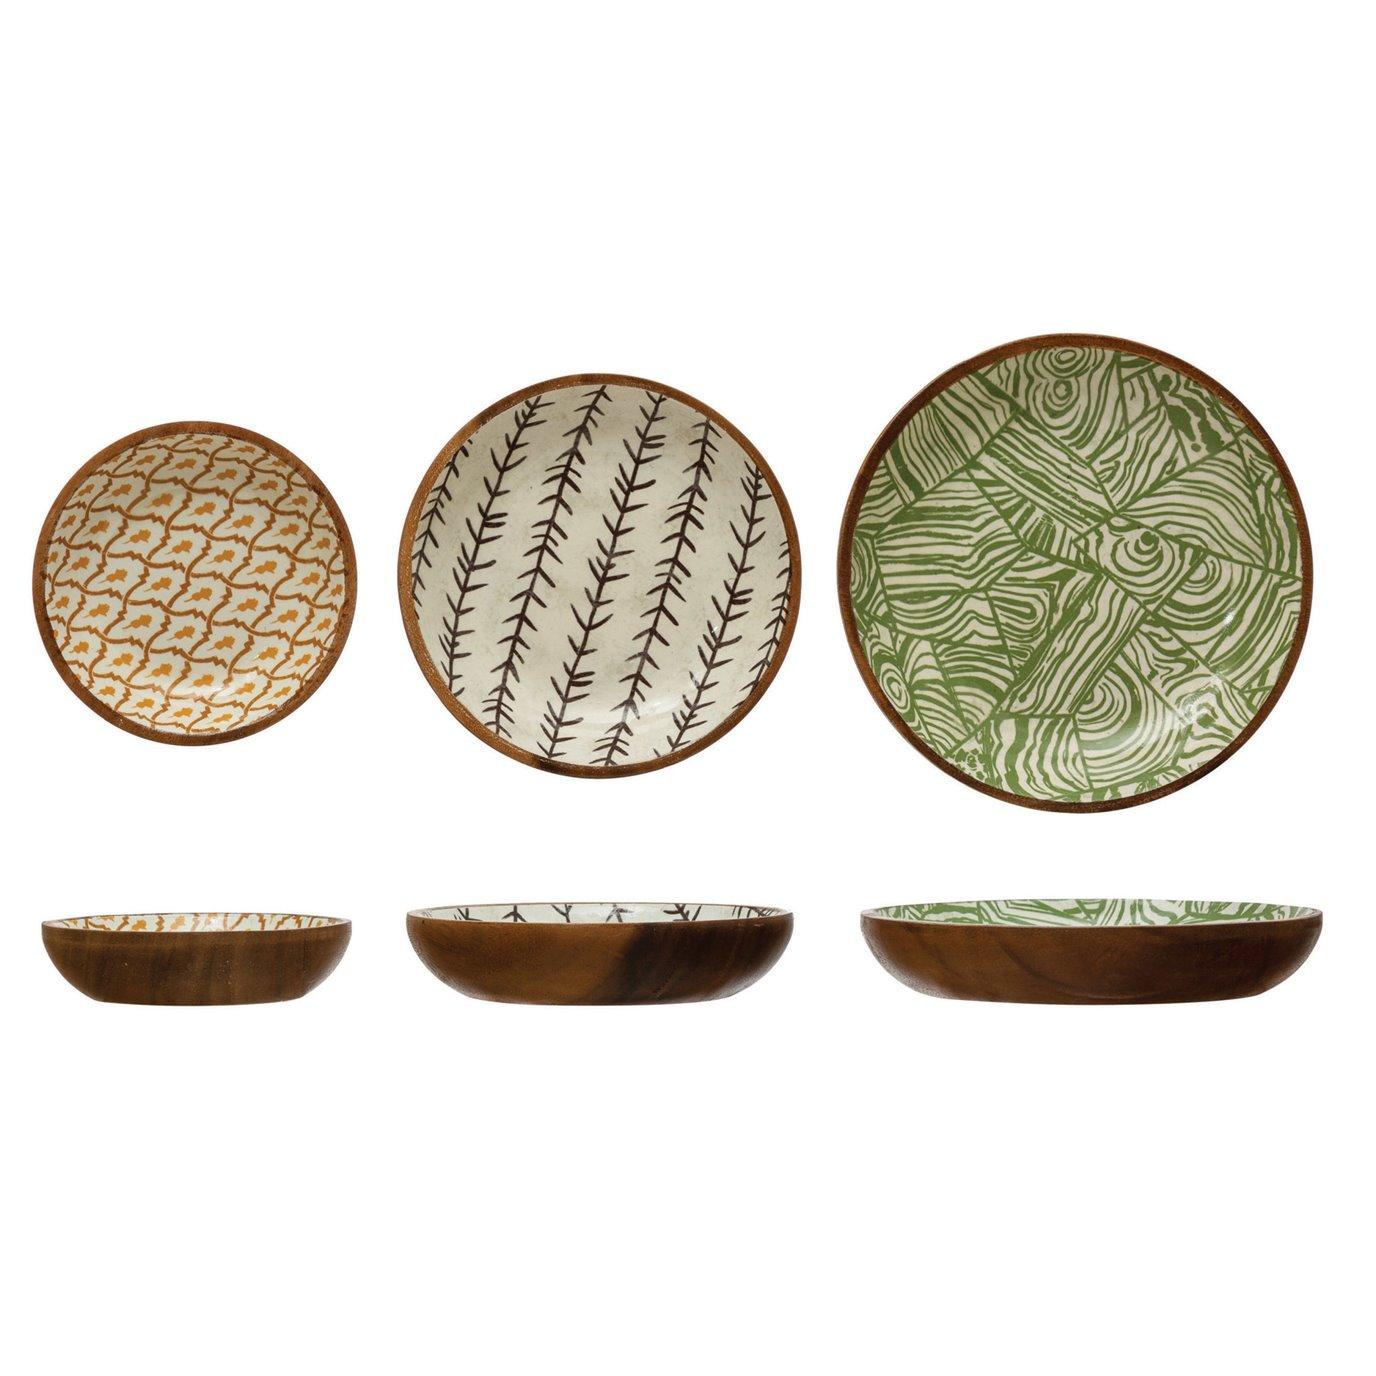 Enameled Acacia Wood Bowls with Print, Set of 3 ©